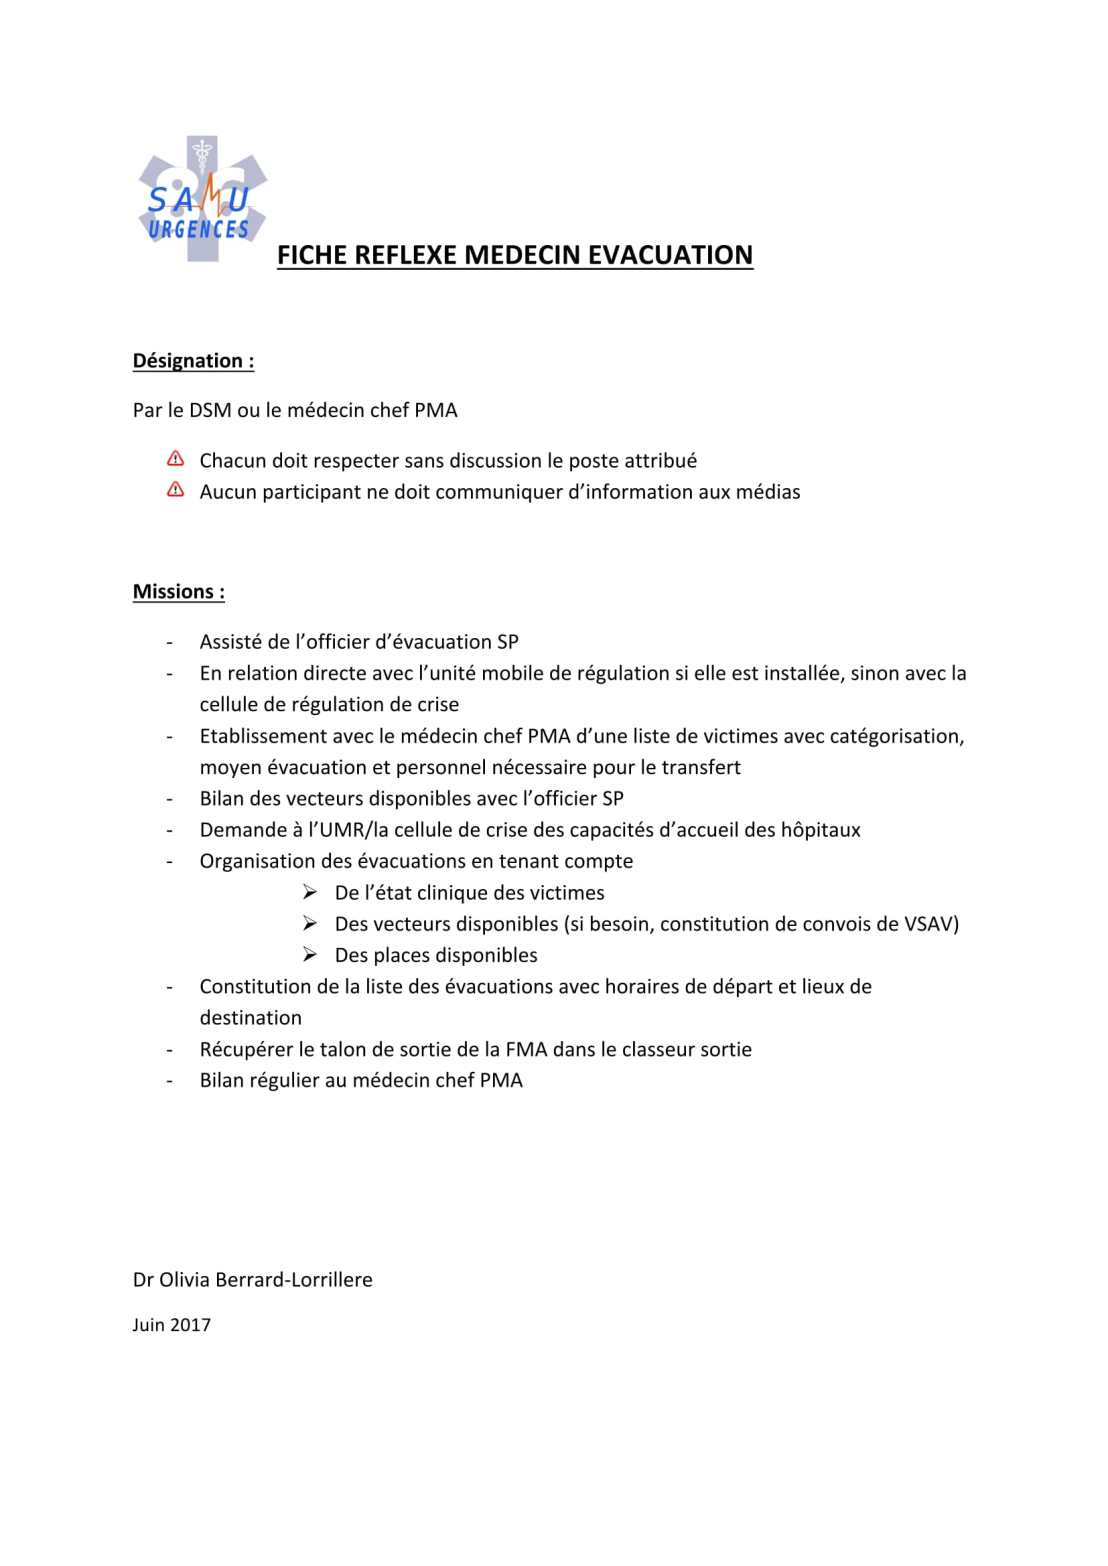 medecinevac_reflexe-1